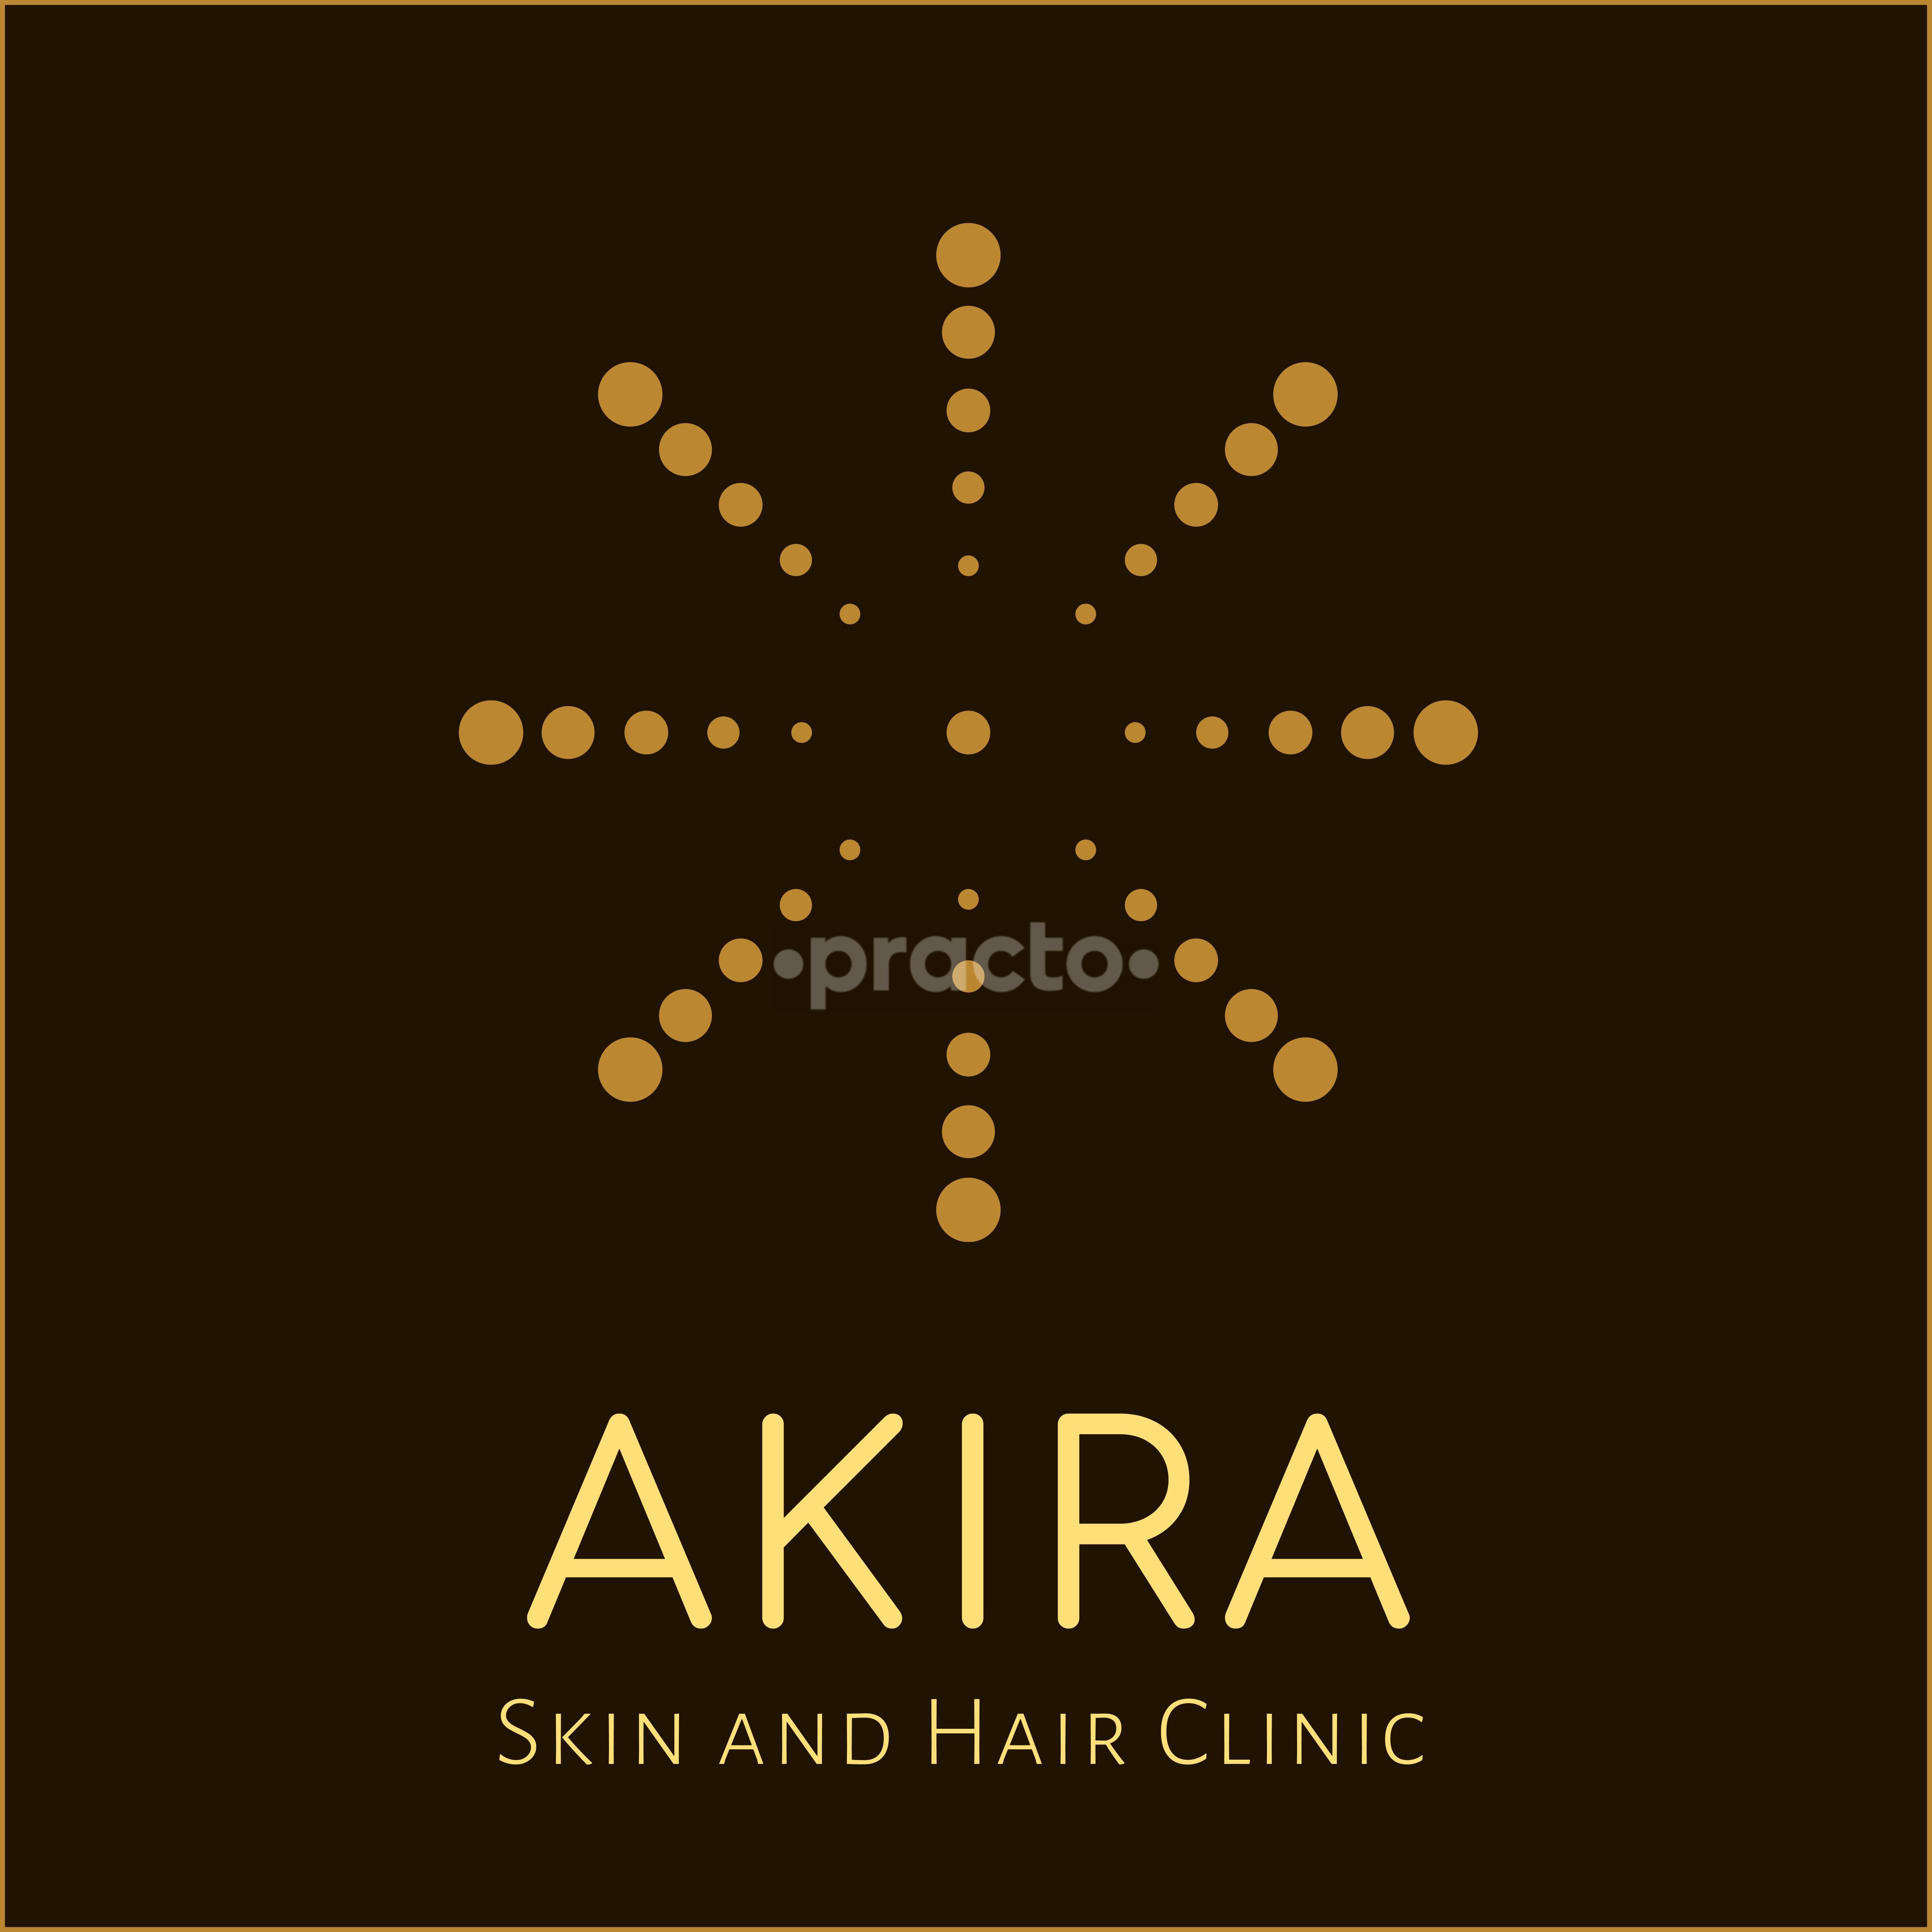 Akira Skin And Hair Clinic